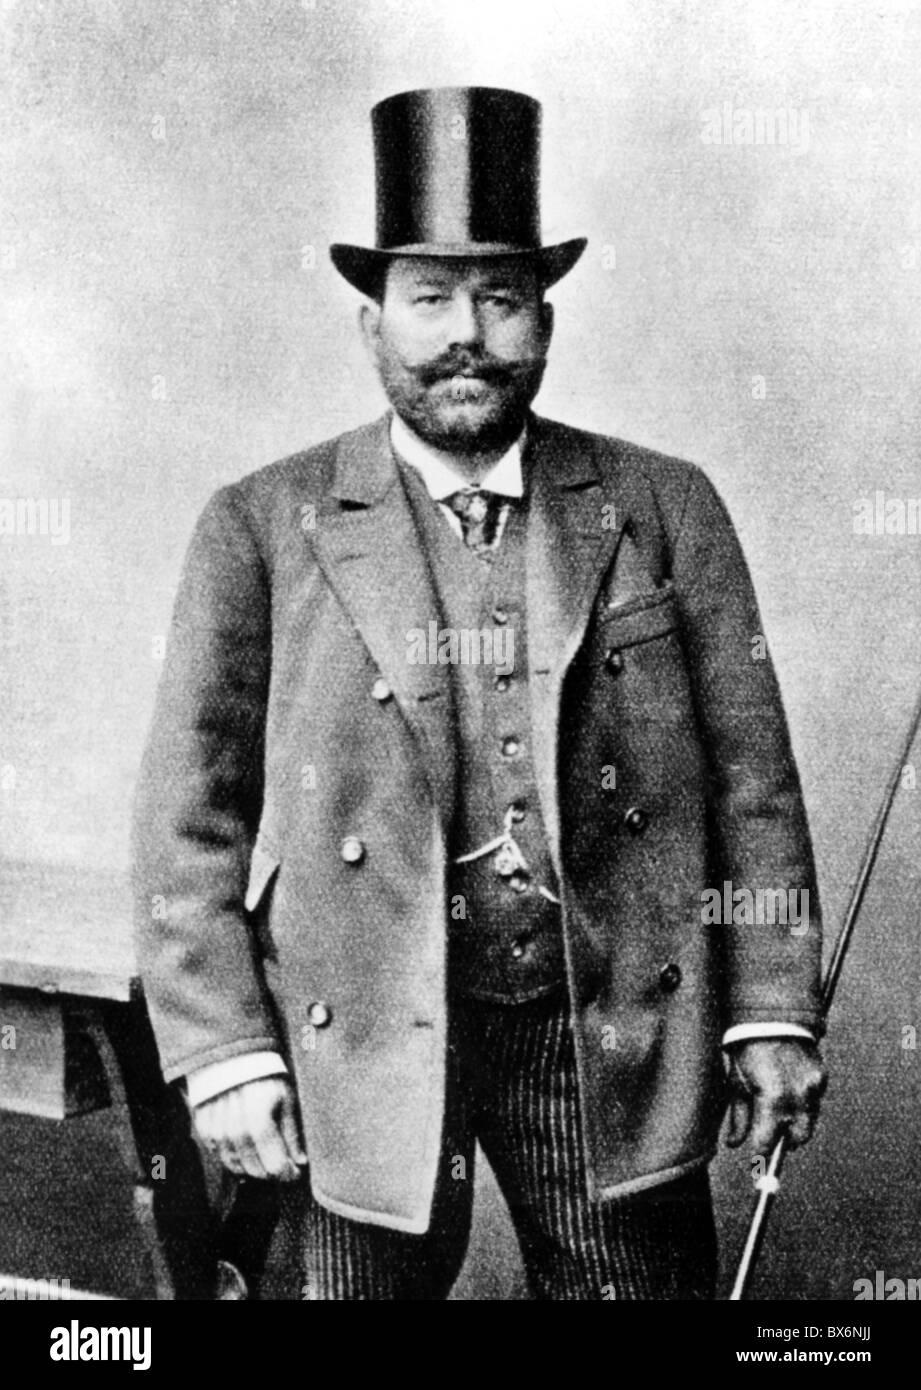 Bratfisch, Josef, 26.8.1847 - 16.12.1892, Viennese coachman, half length, circa 1888, , Additional-Rights-Clearances - Stock Image